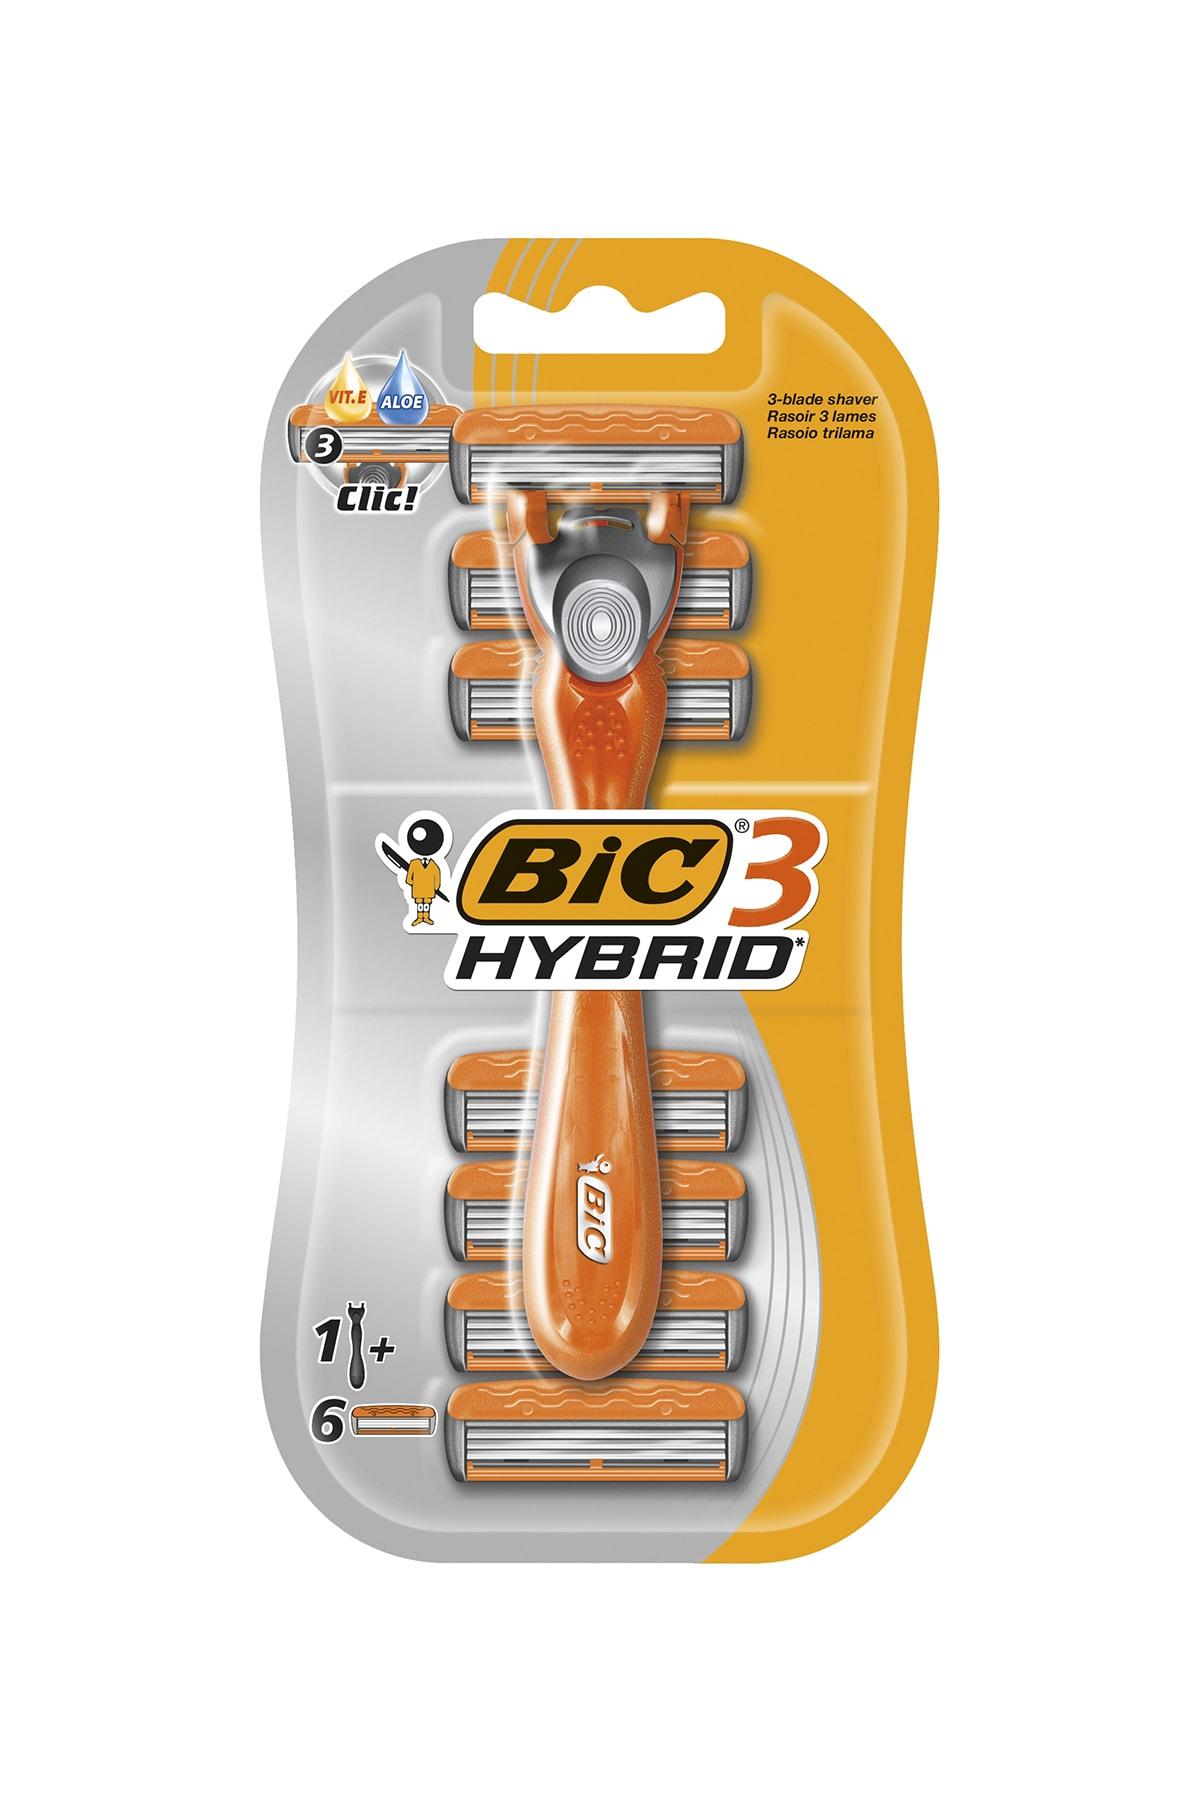 Bic 3 Hybrid Tıraş Bıçağı 6 Kartuşlu (3 Bıçak) 1